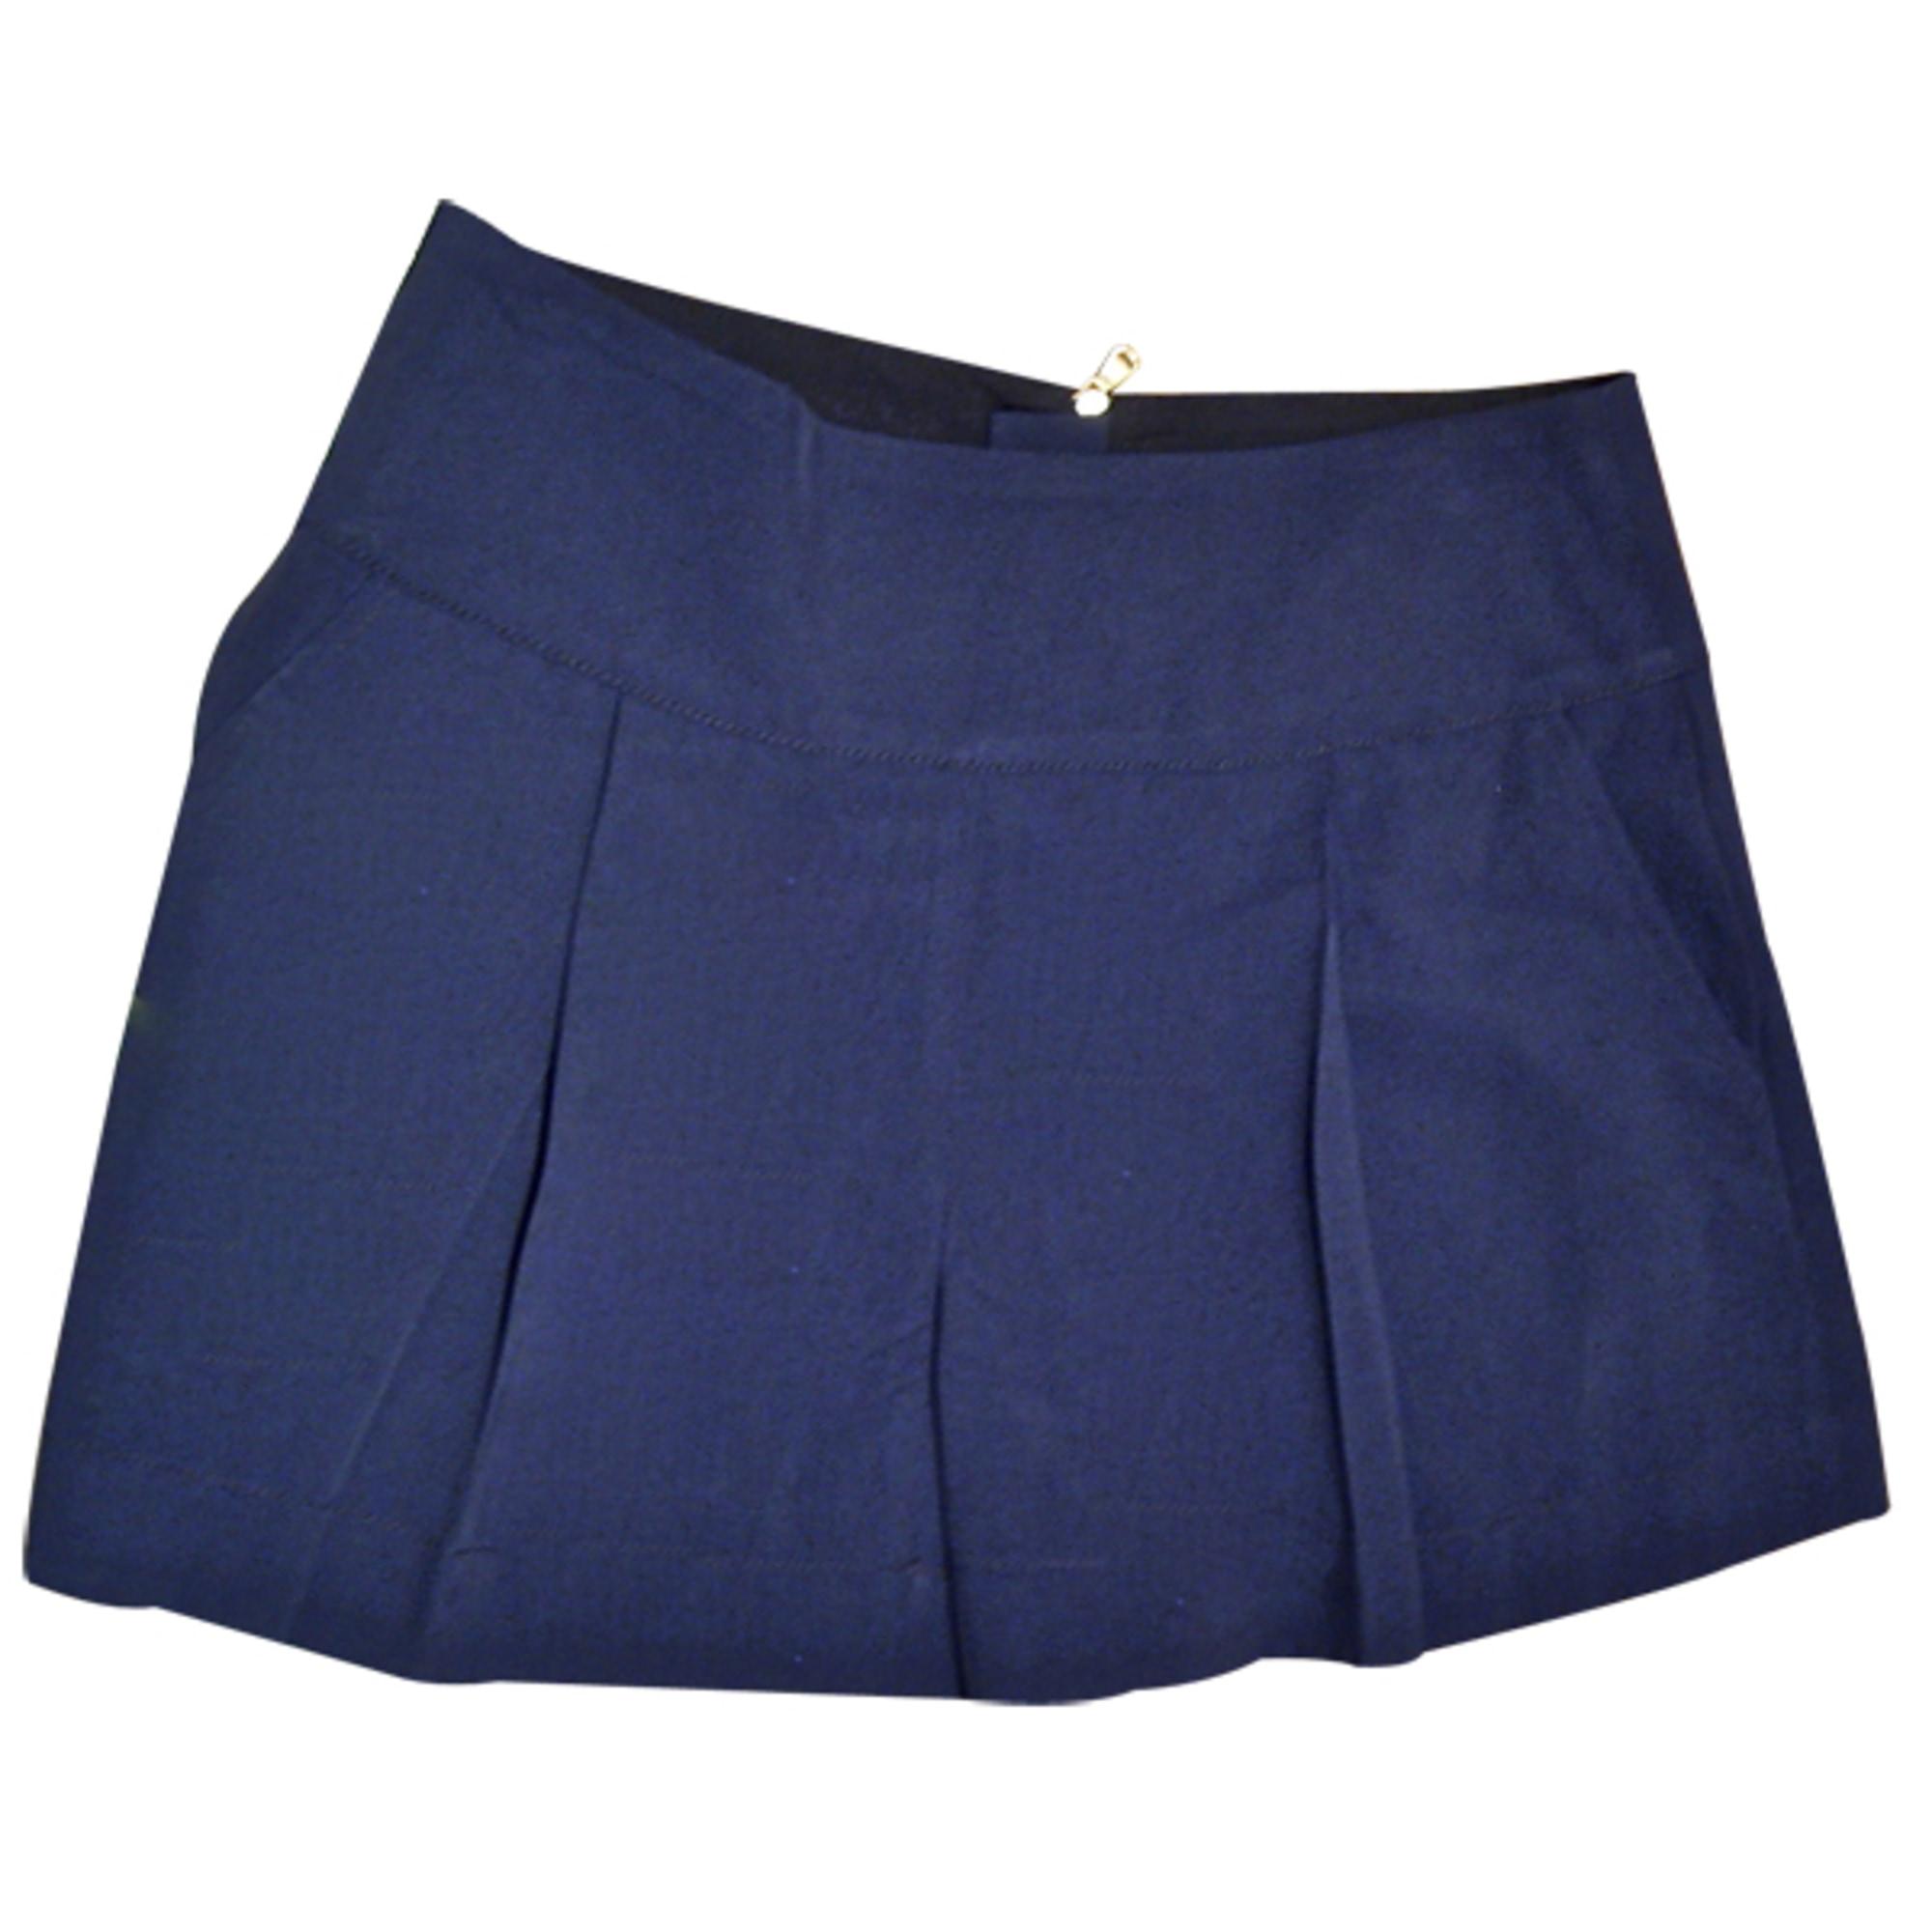 Short MARC JACOBS Bleu, bleu marine, bleu turquoise